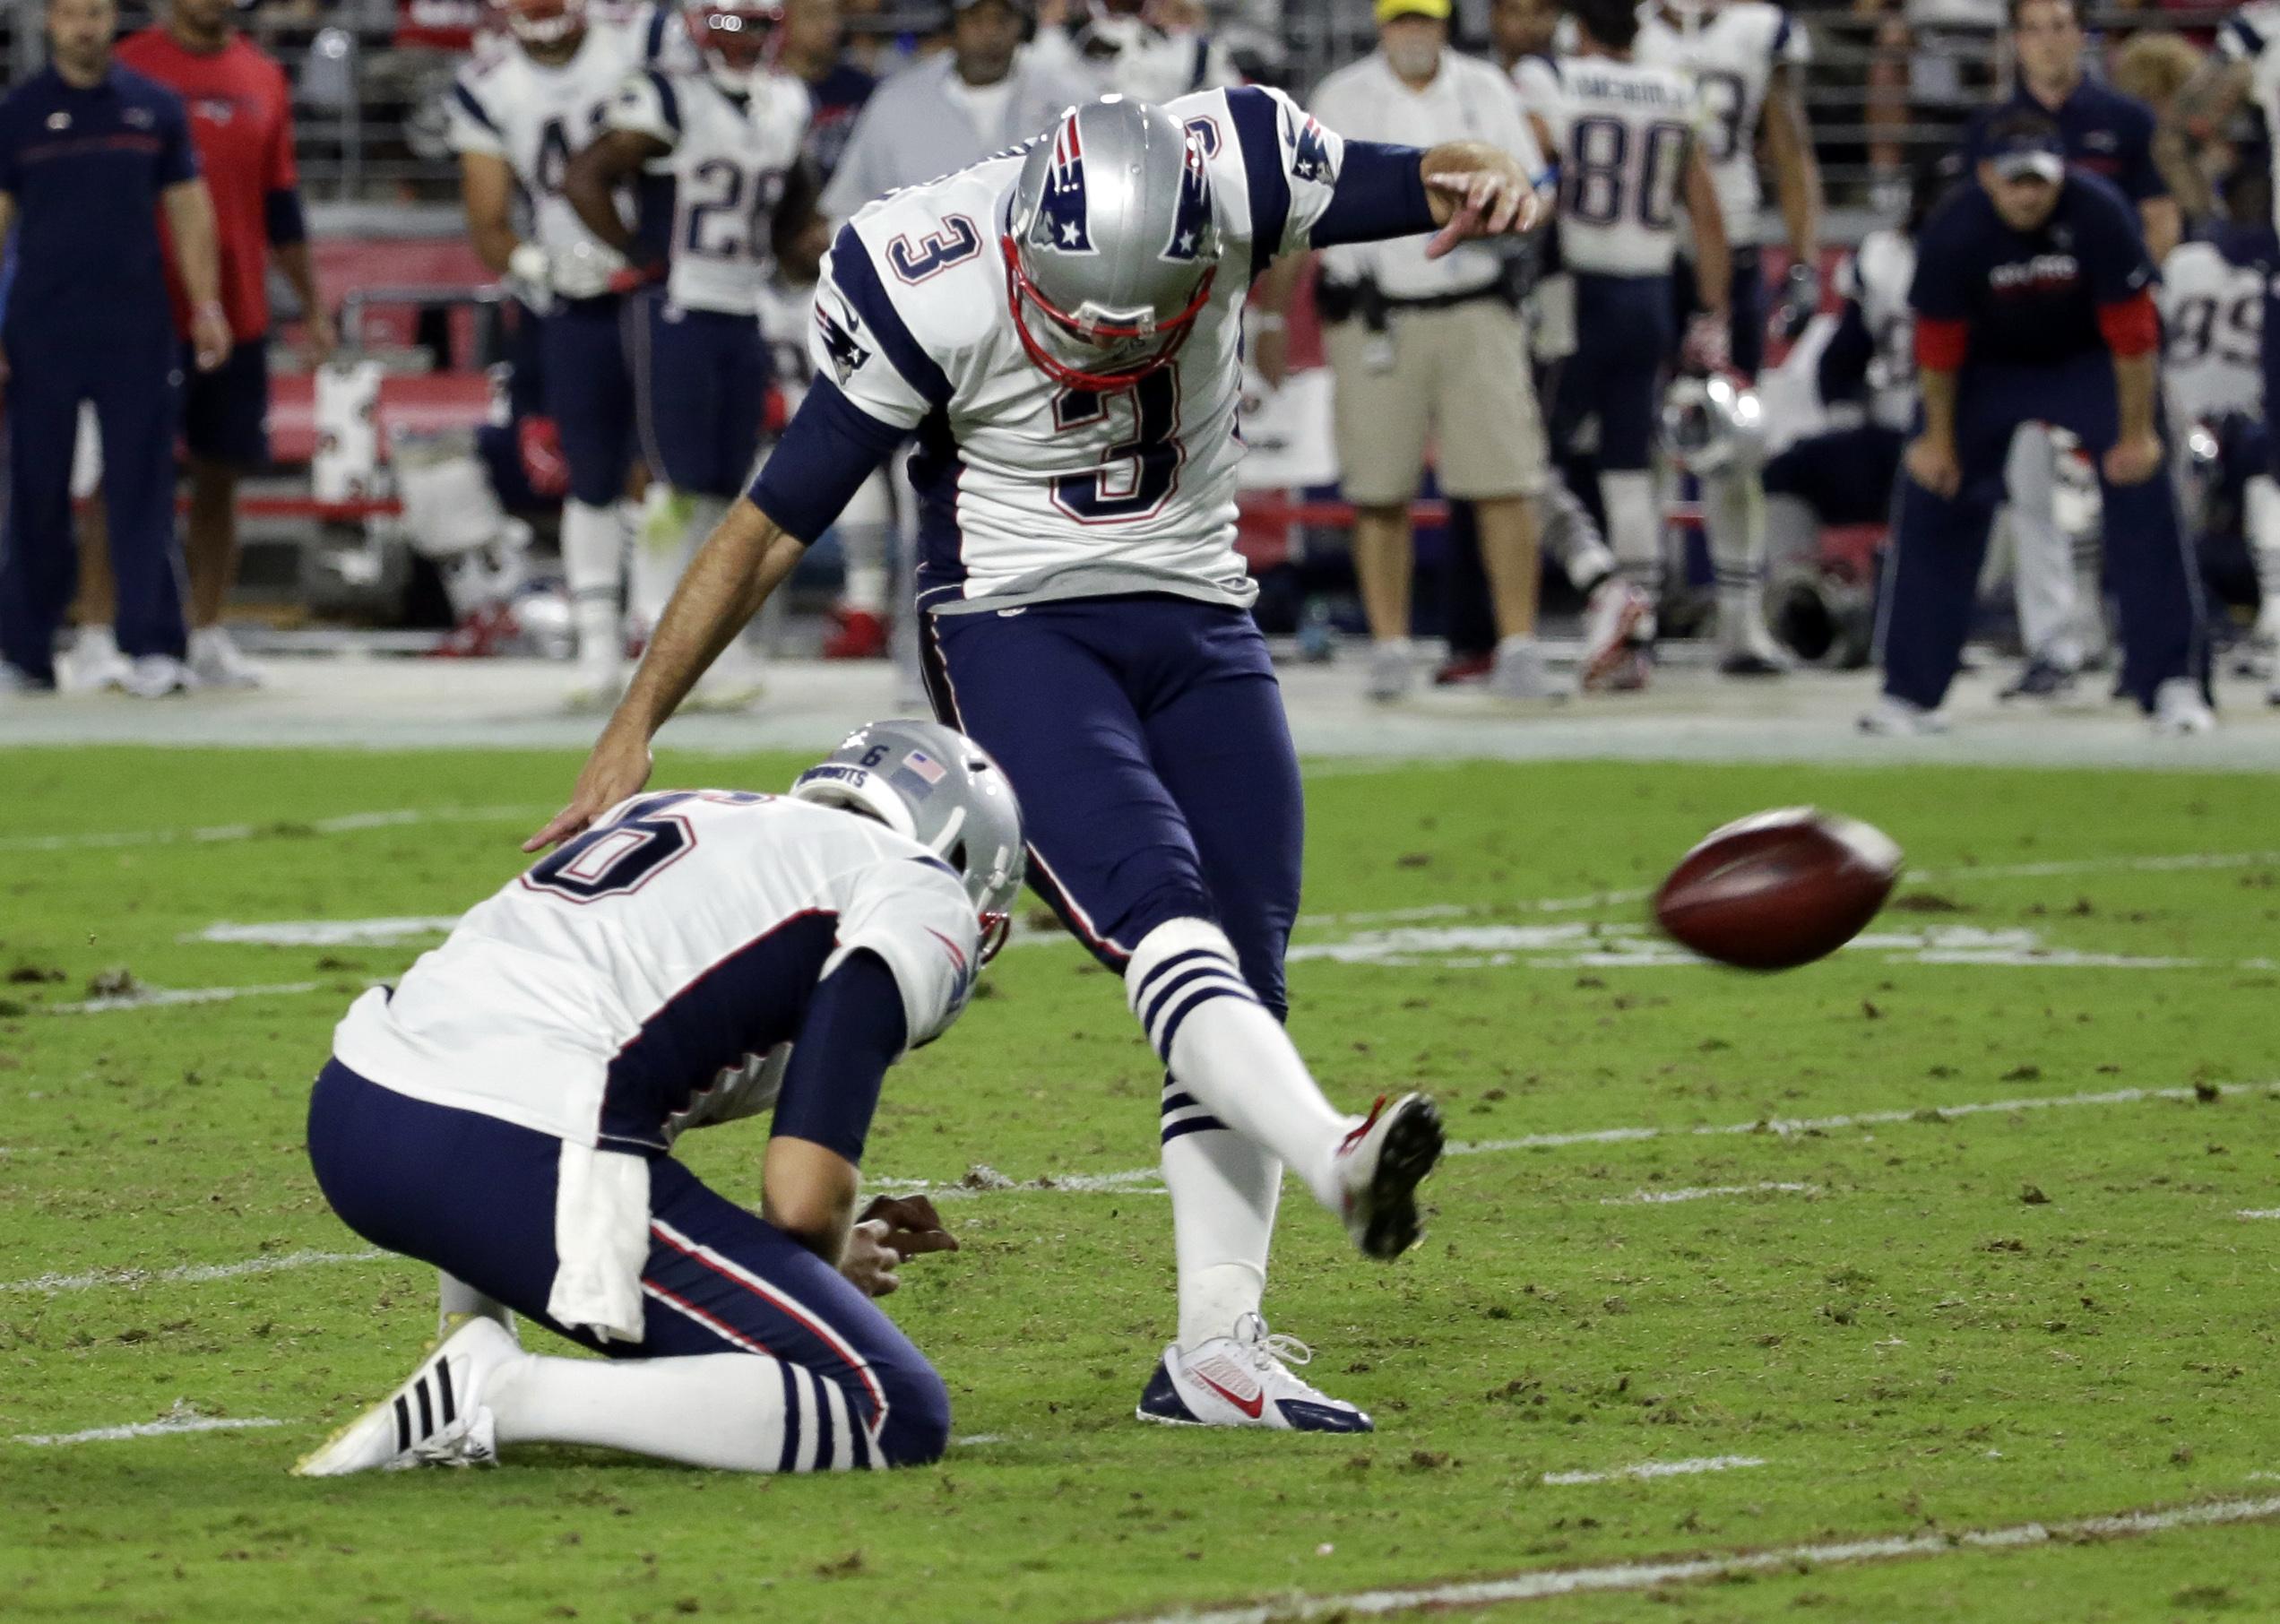 New England Patriots kicker Stephen Gostkowski (3) kicks a field goal as punter Ryan Allen (6) holds during the second half of an NFL football game against the Arizona Cardinals, Sunday, Sept. 11, 2016, in Glendale, Ariz. (AP Photo/Rick Scuteri)